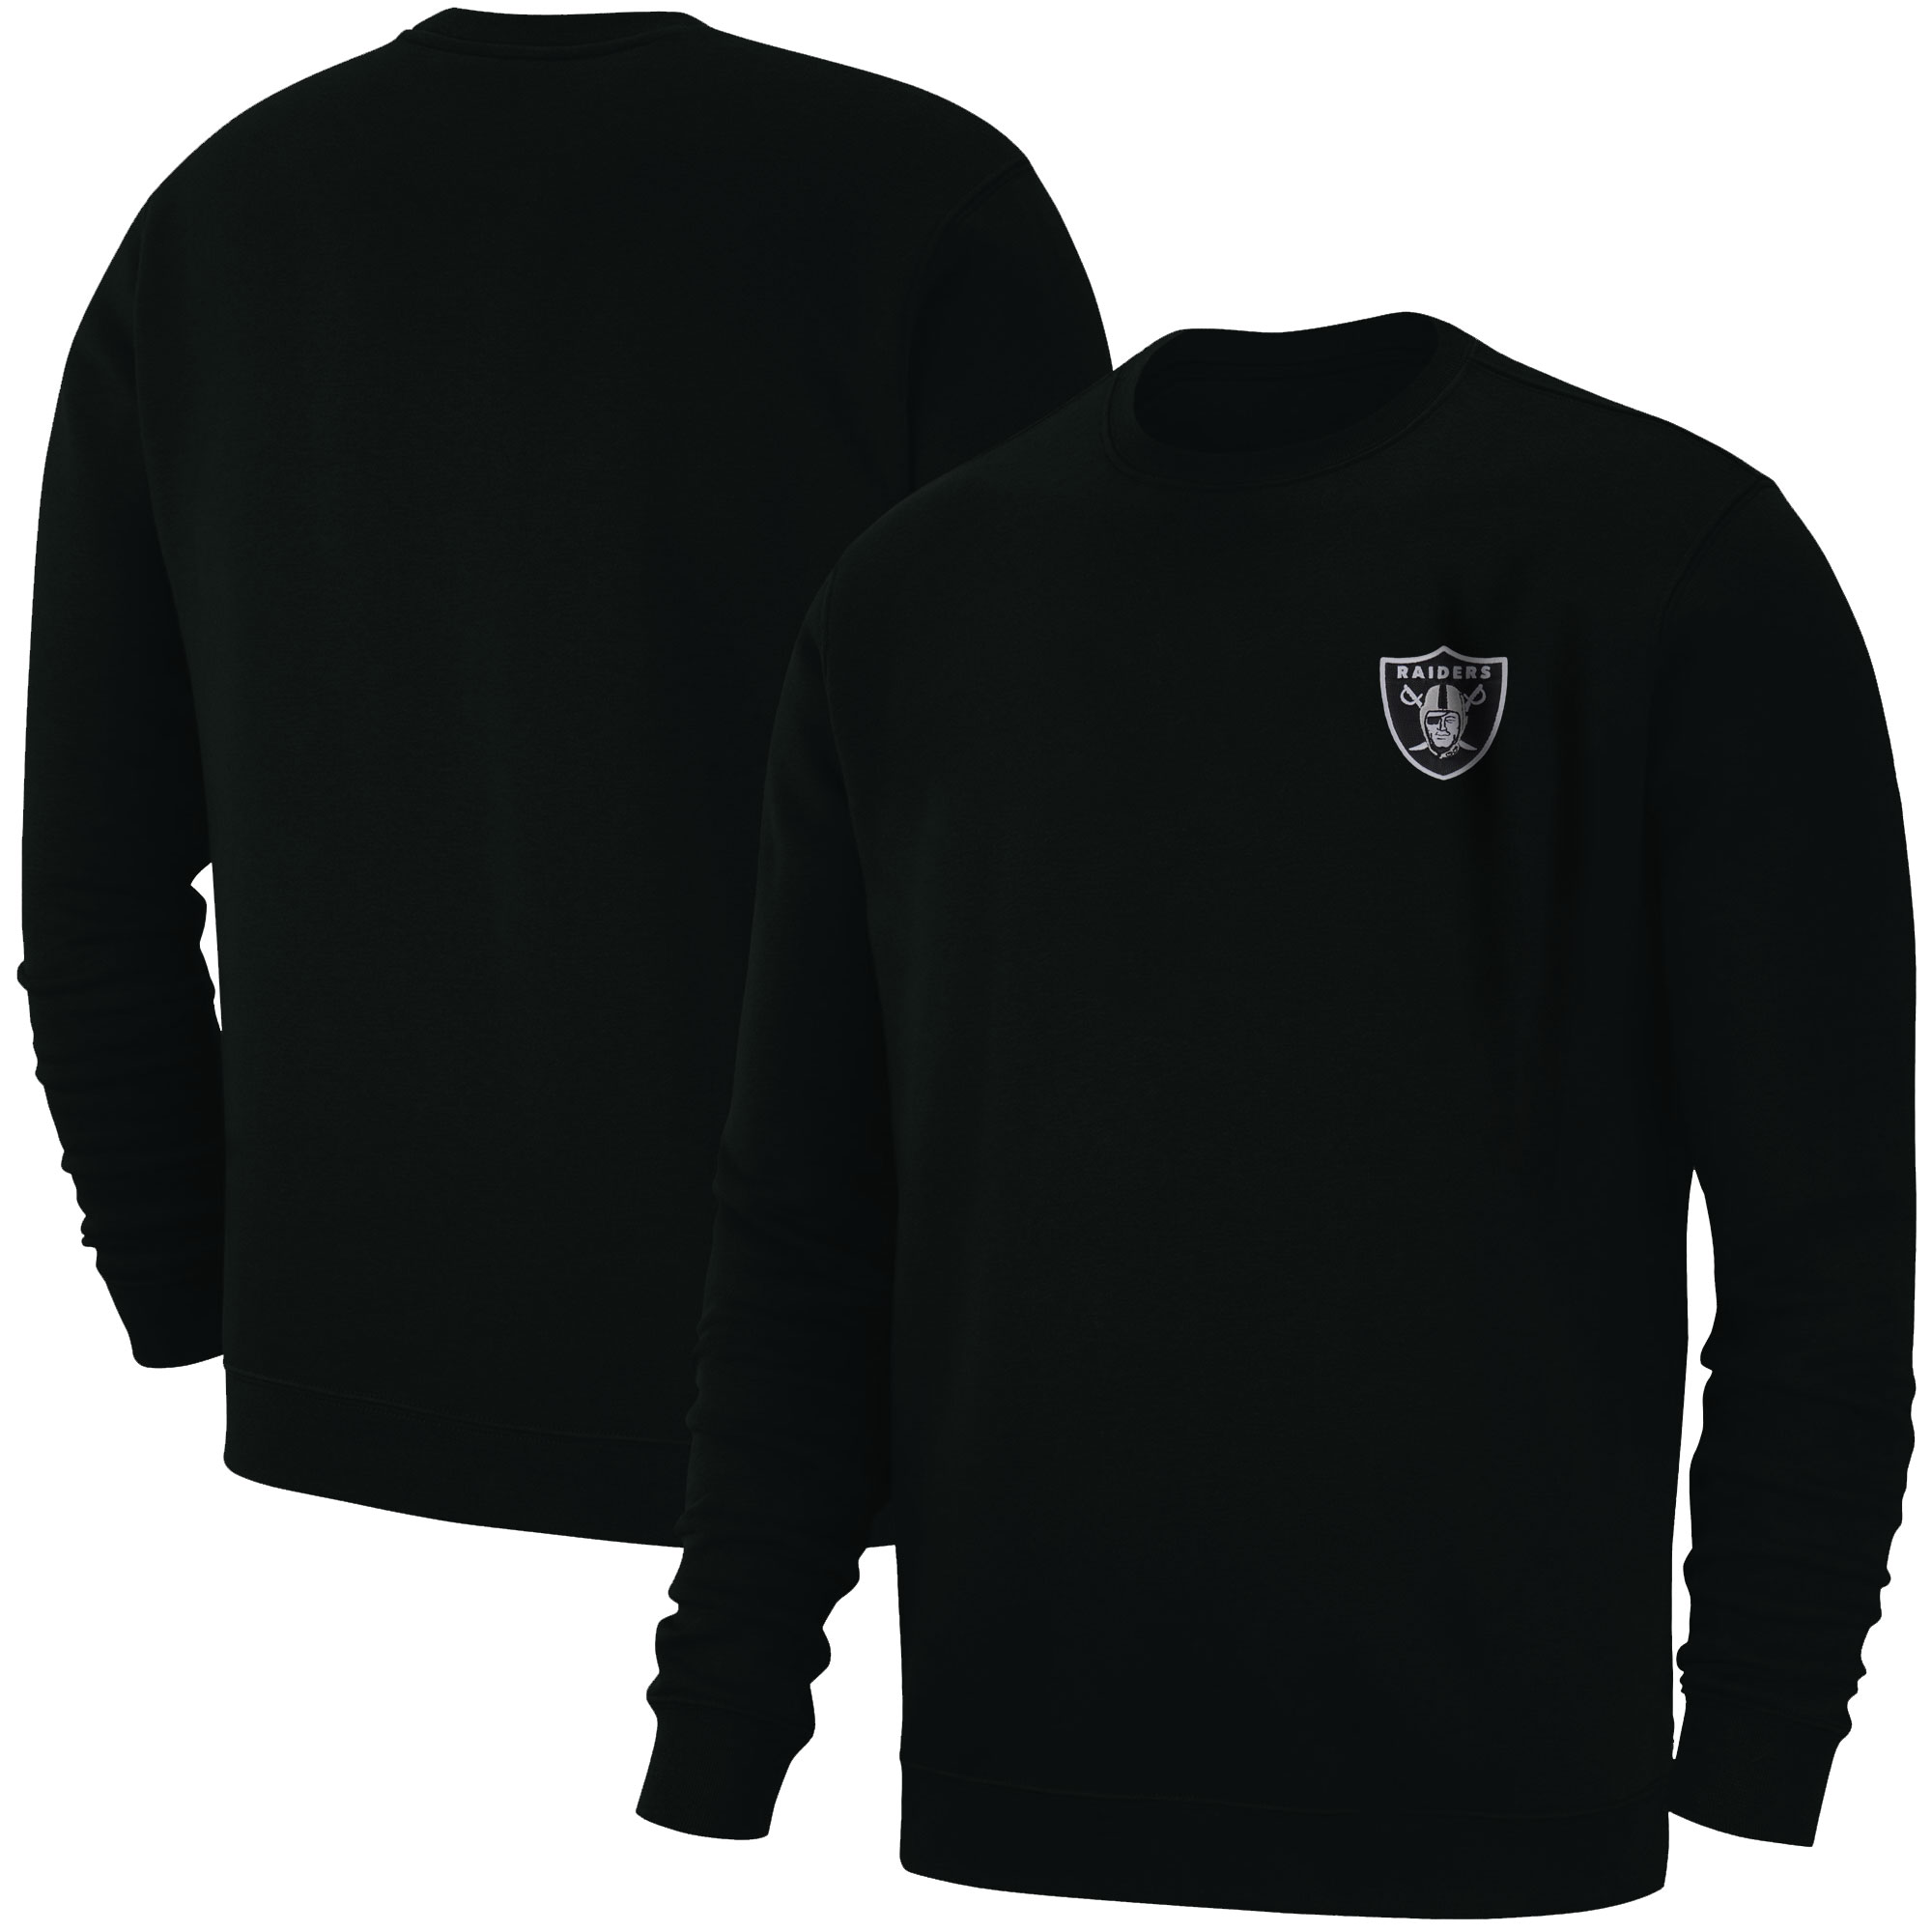 Oakland Raiders Basic (Örme)  (BSC-BLC-EMBR-RAIDERS)